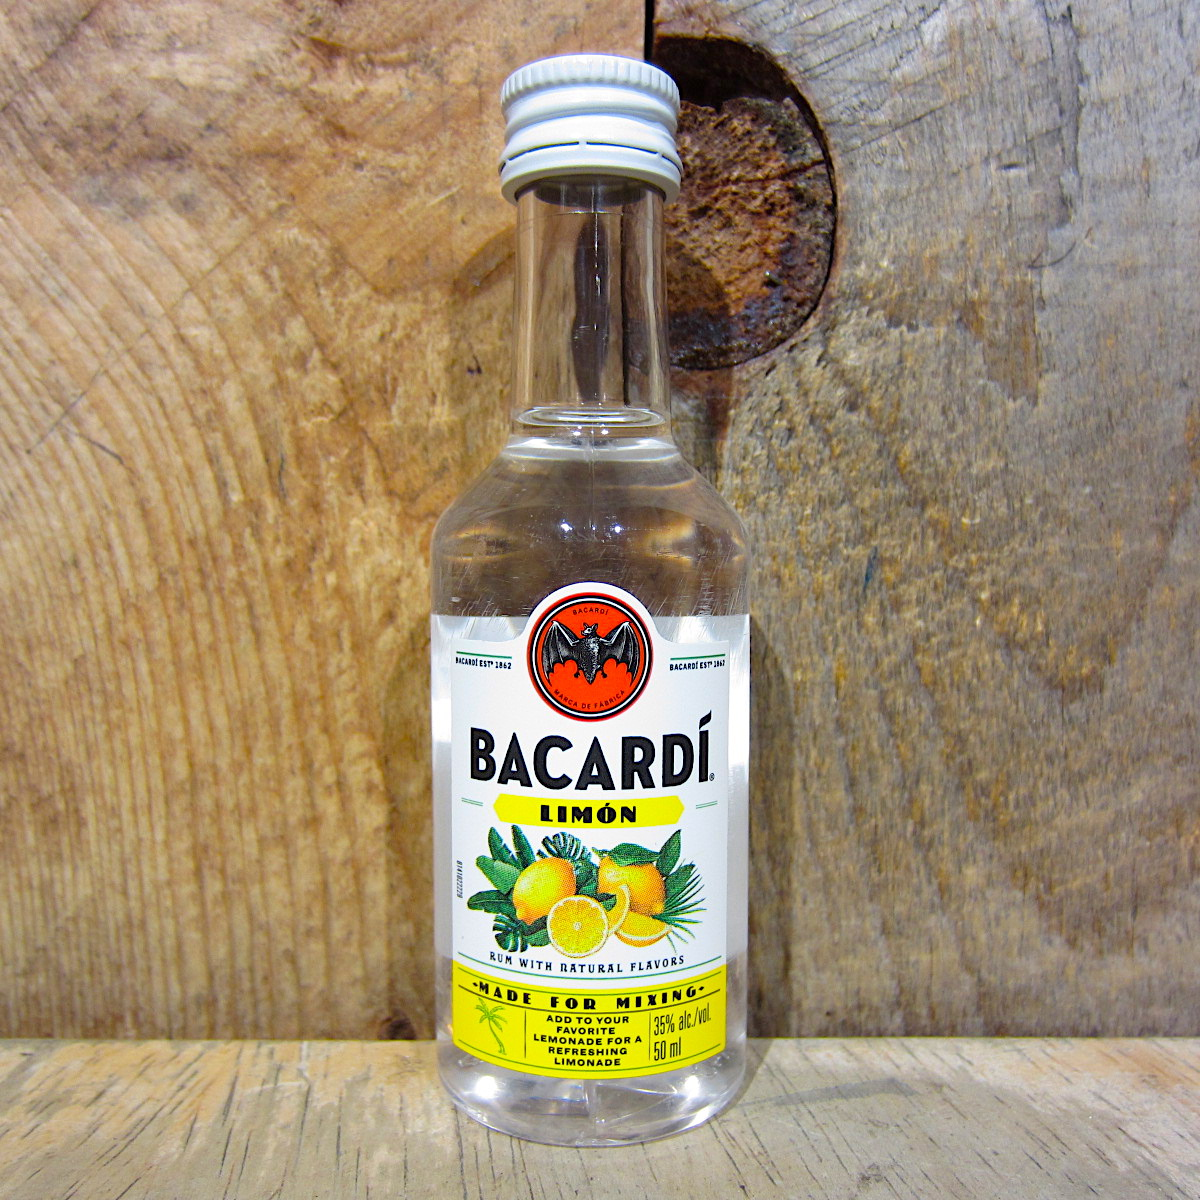 Bacardi Limon 50ml (Miniature)